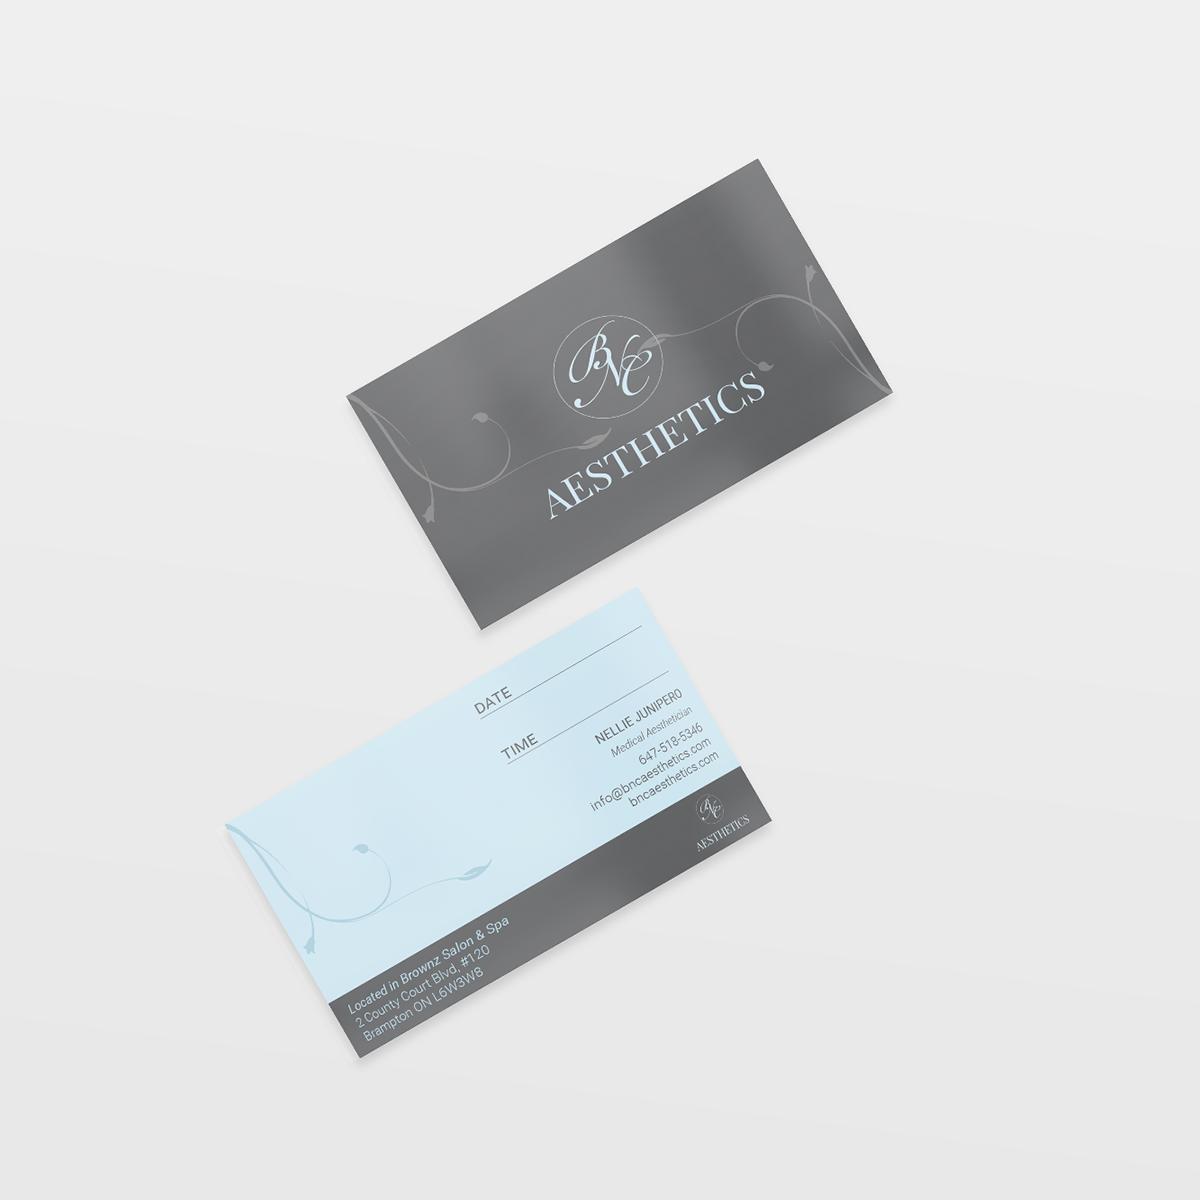 BNC Aesthetics: Business Cards on Behance